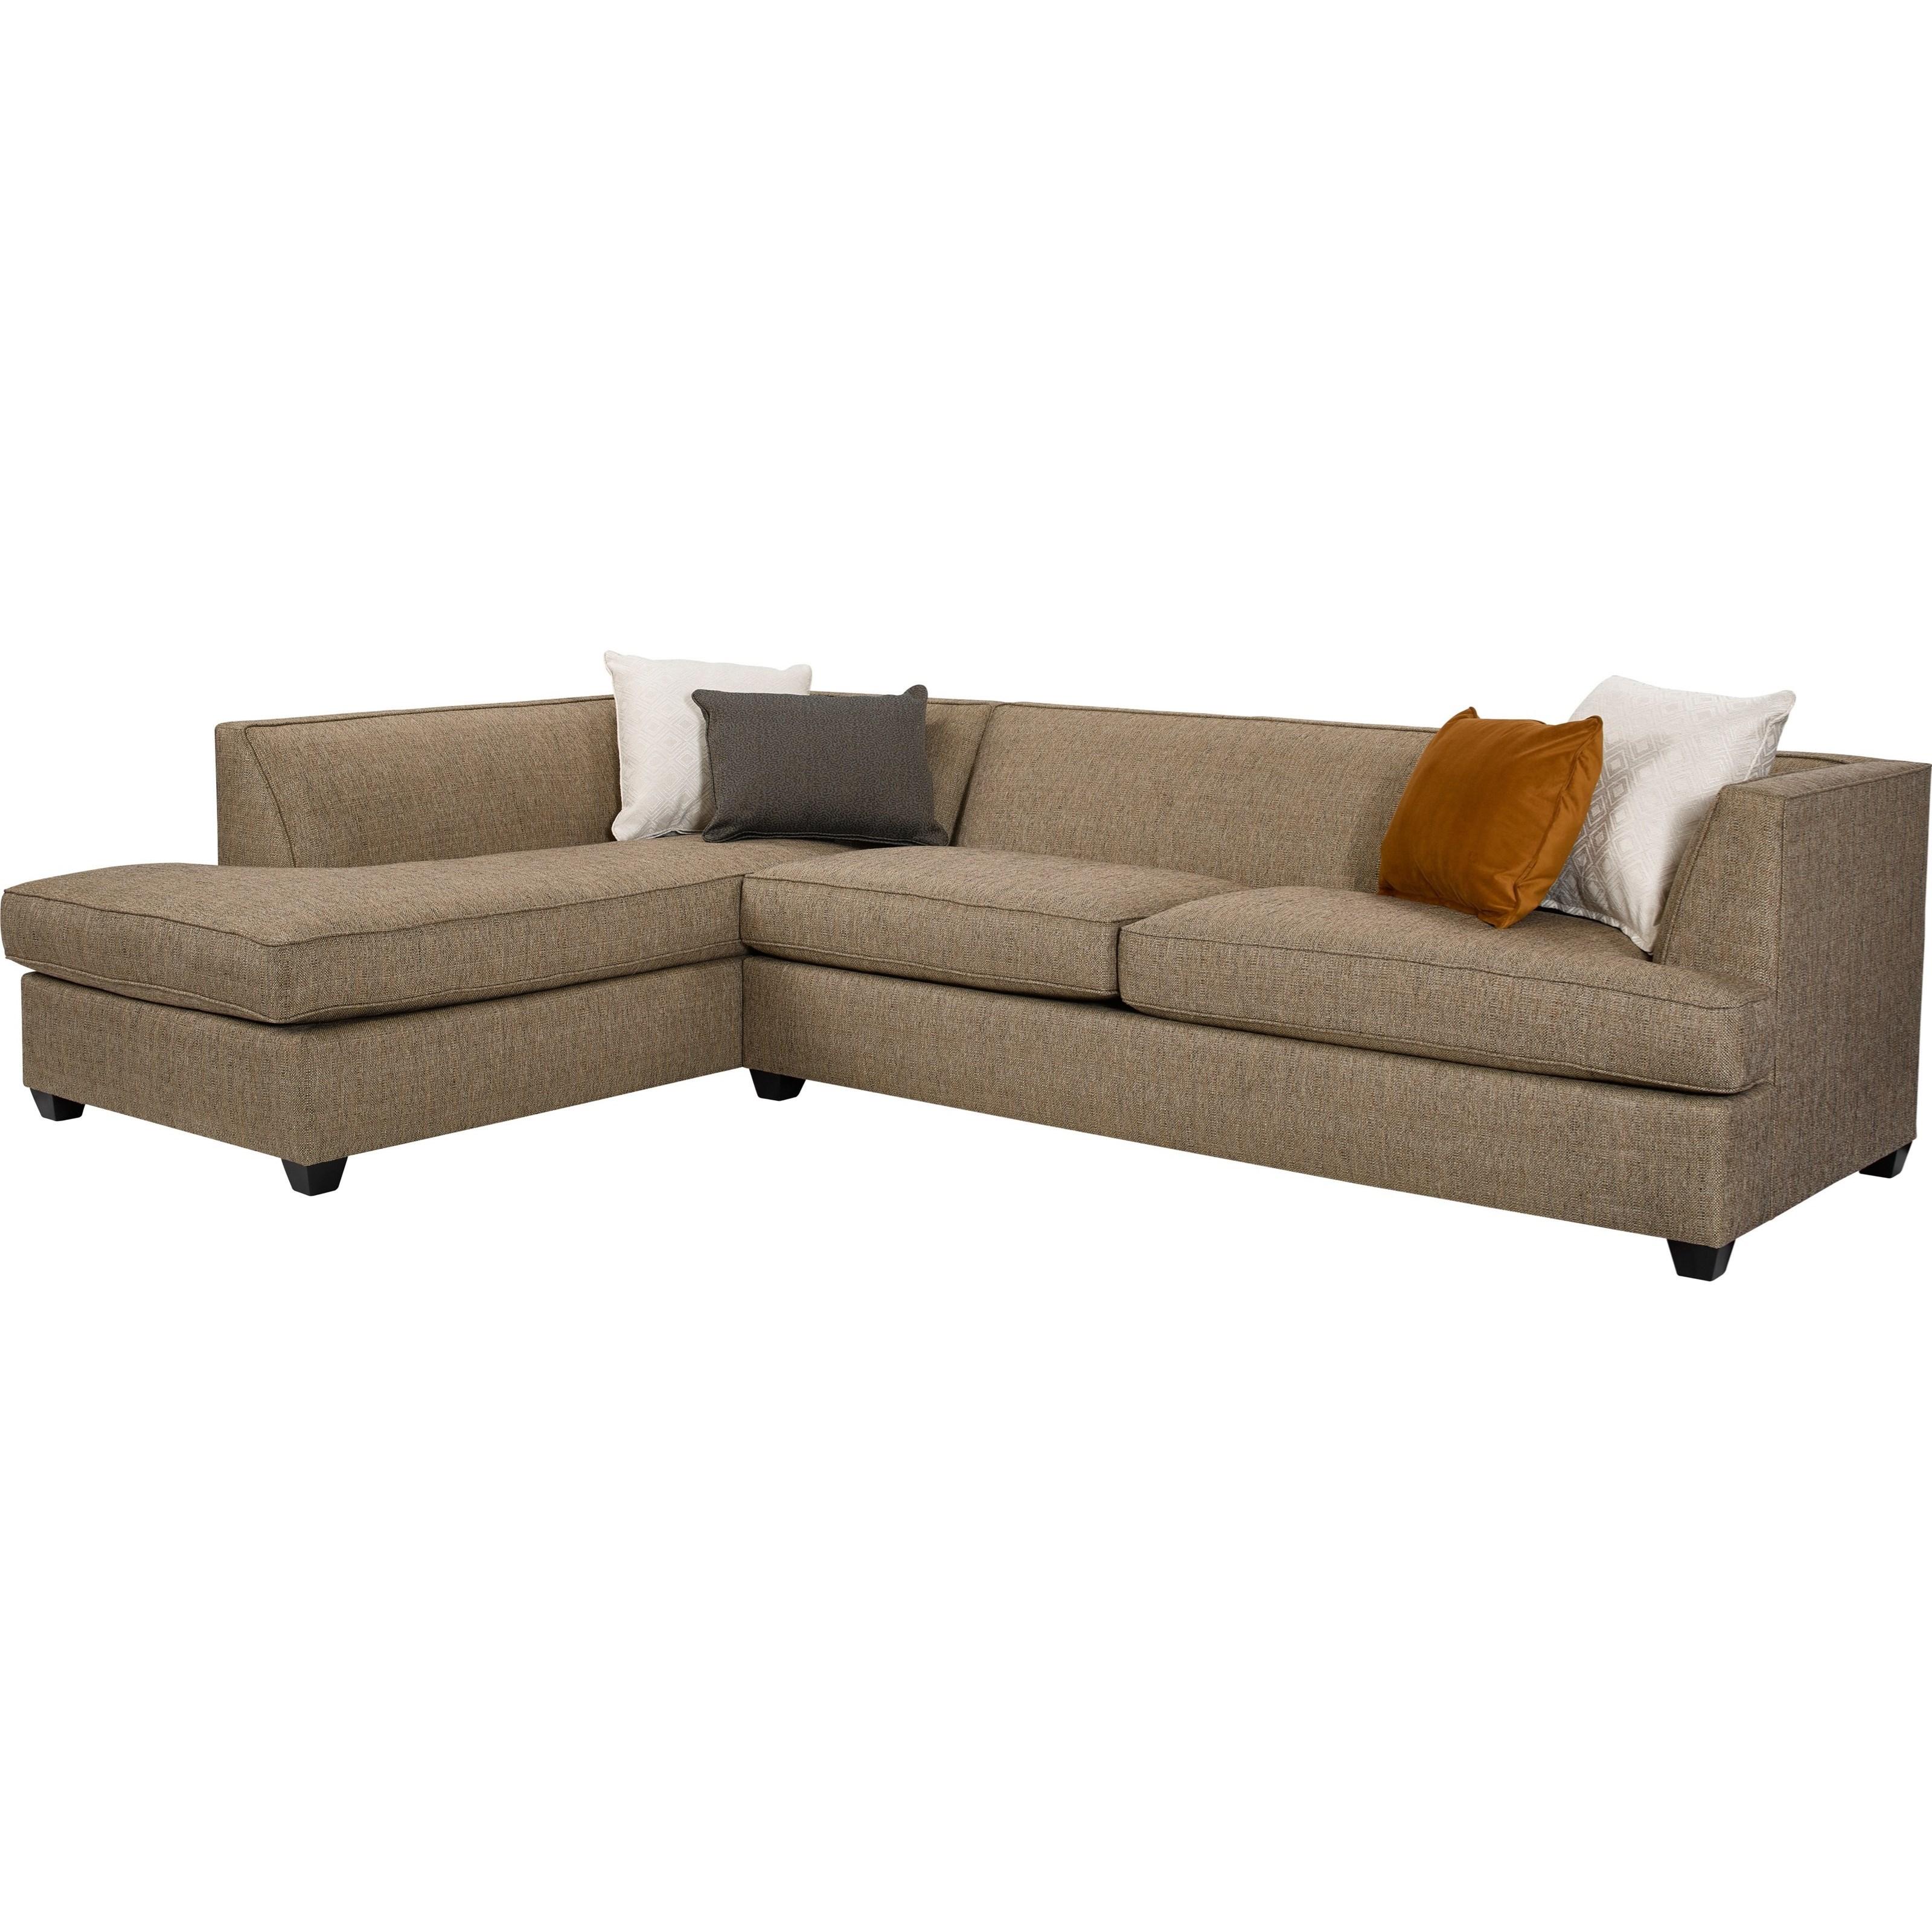 Broyhill furniture farida 2 piece sectional sofa with laf for Broyhill sectional sofa with chaise